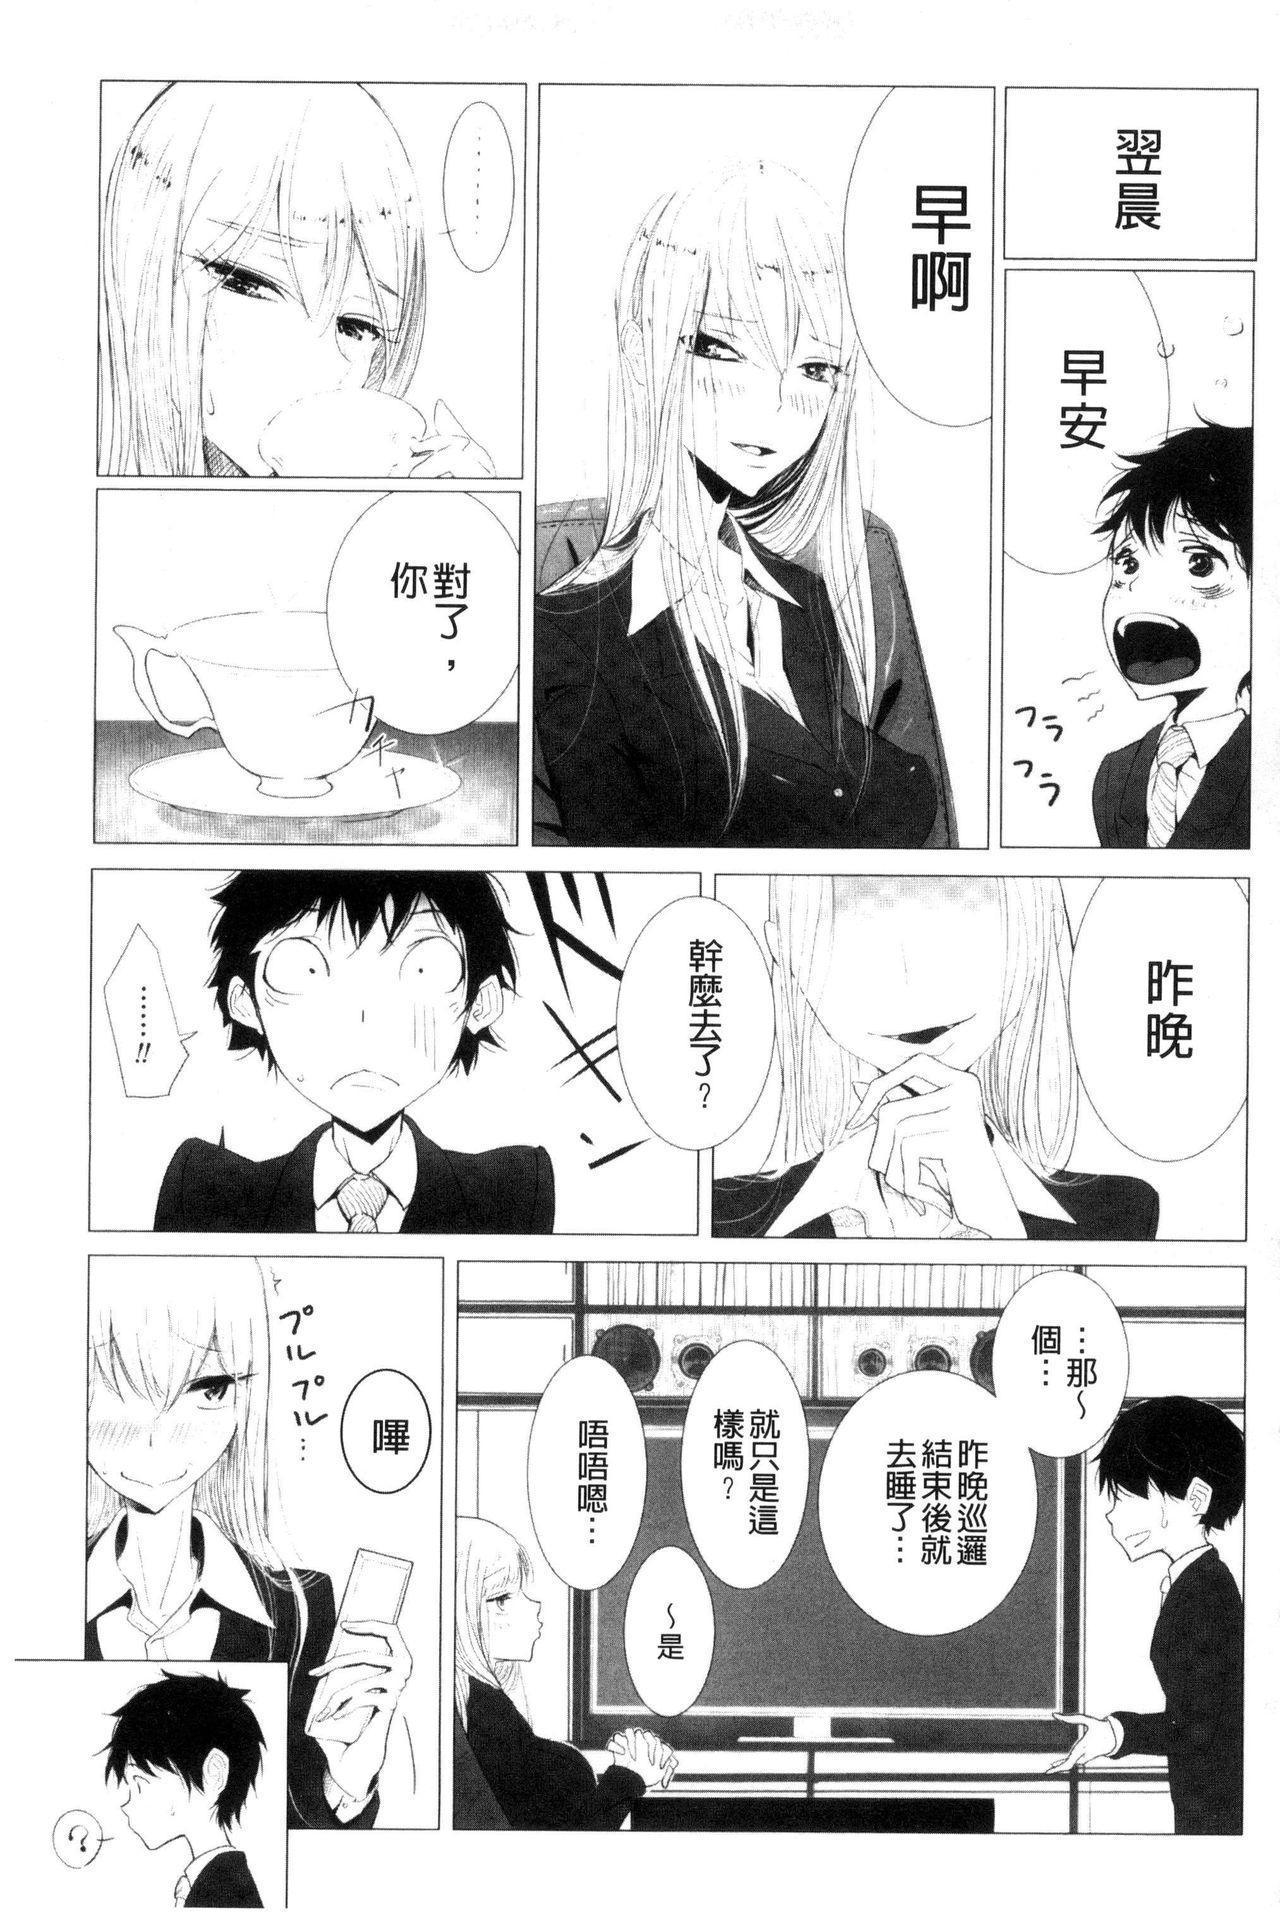 [Dhibi] Sono Yubisaki de Korogashite - Please Caress it at the Finger-tip. [Chinese] 168